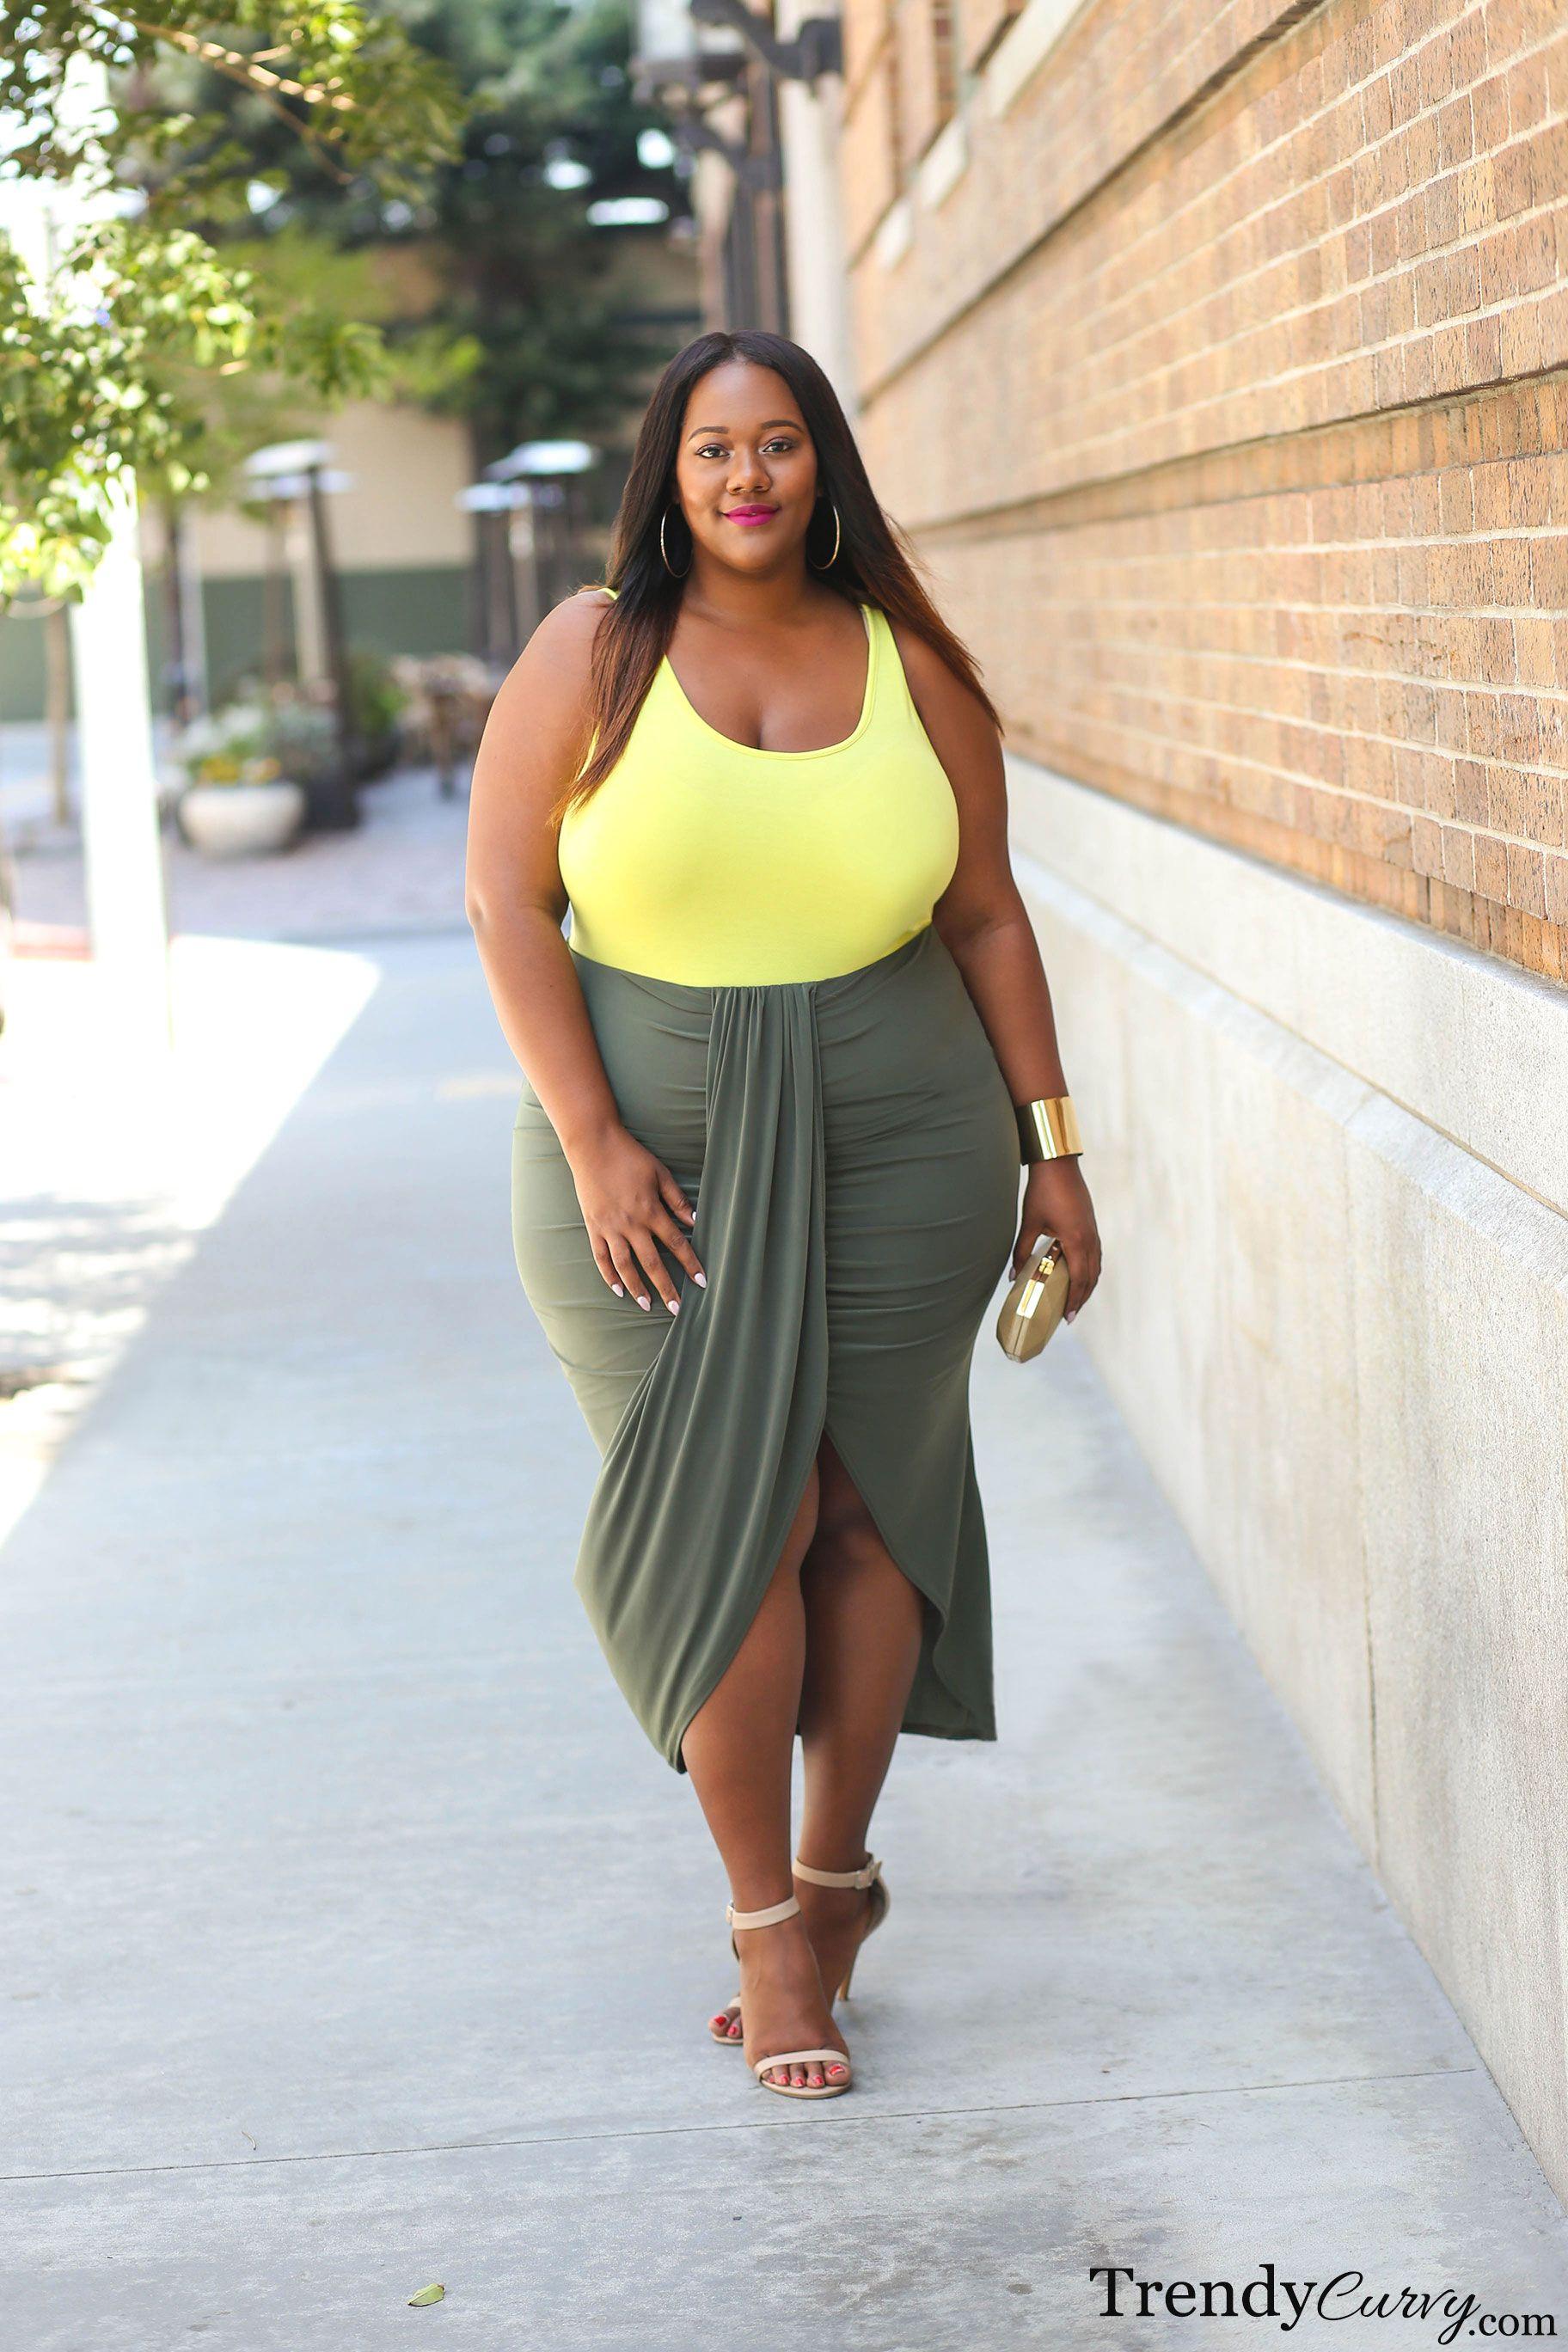 Bbw big beautiful woman